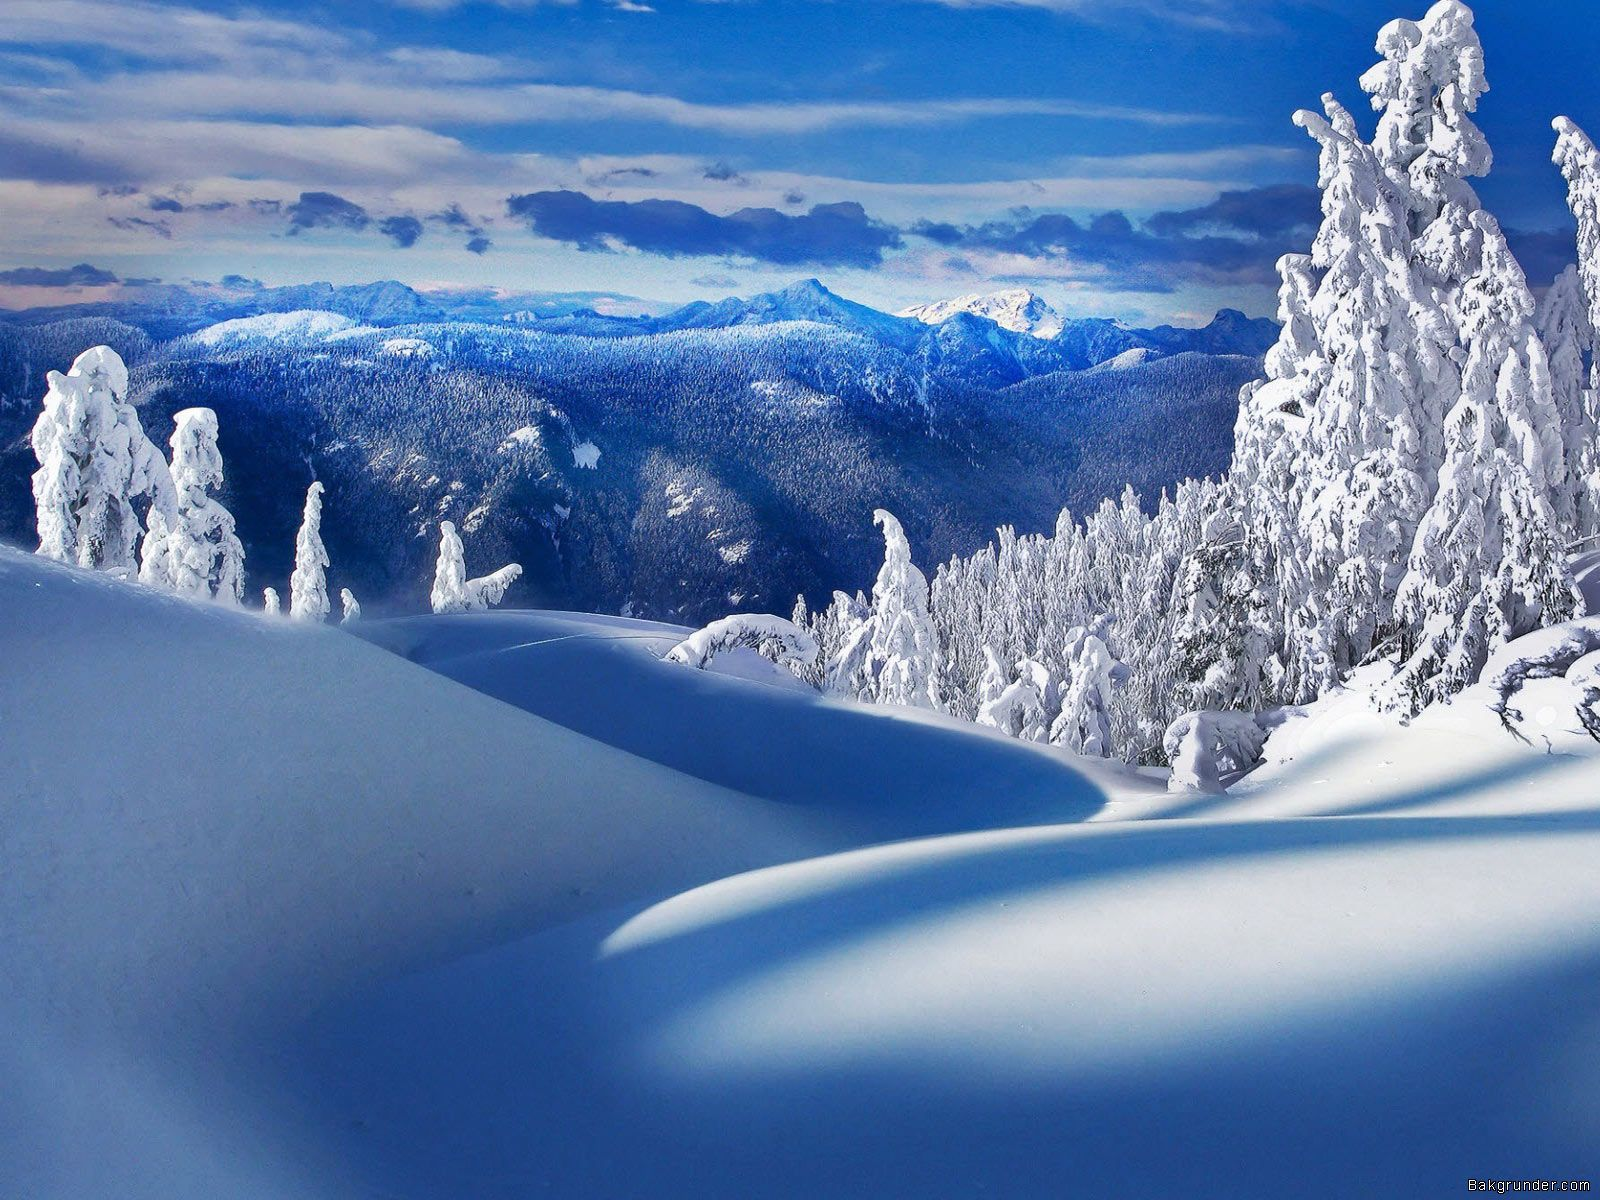 Winter Wonderland Wallpaper Backgrounds